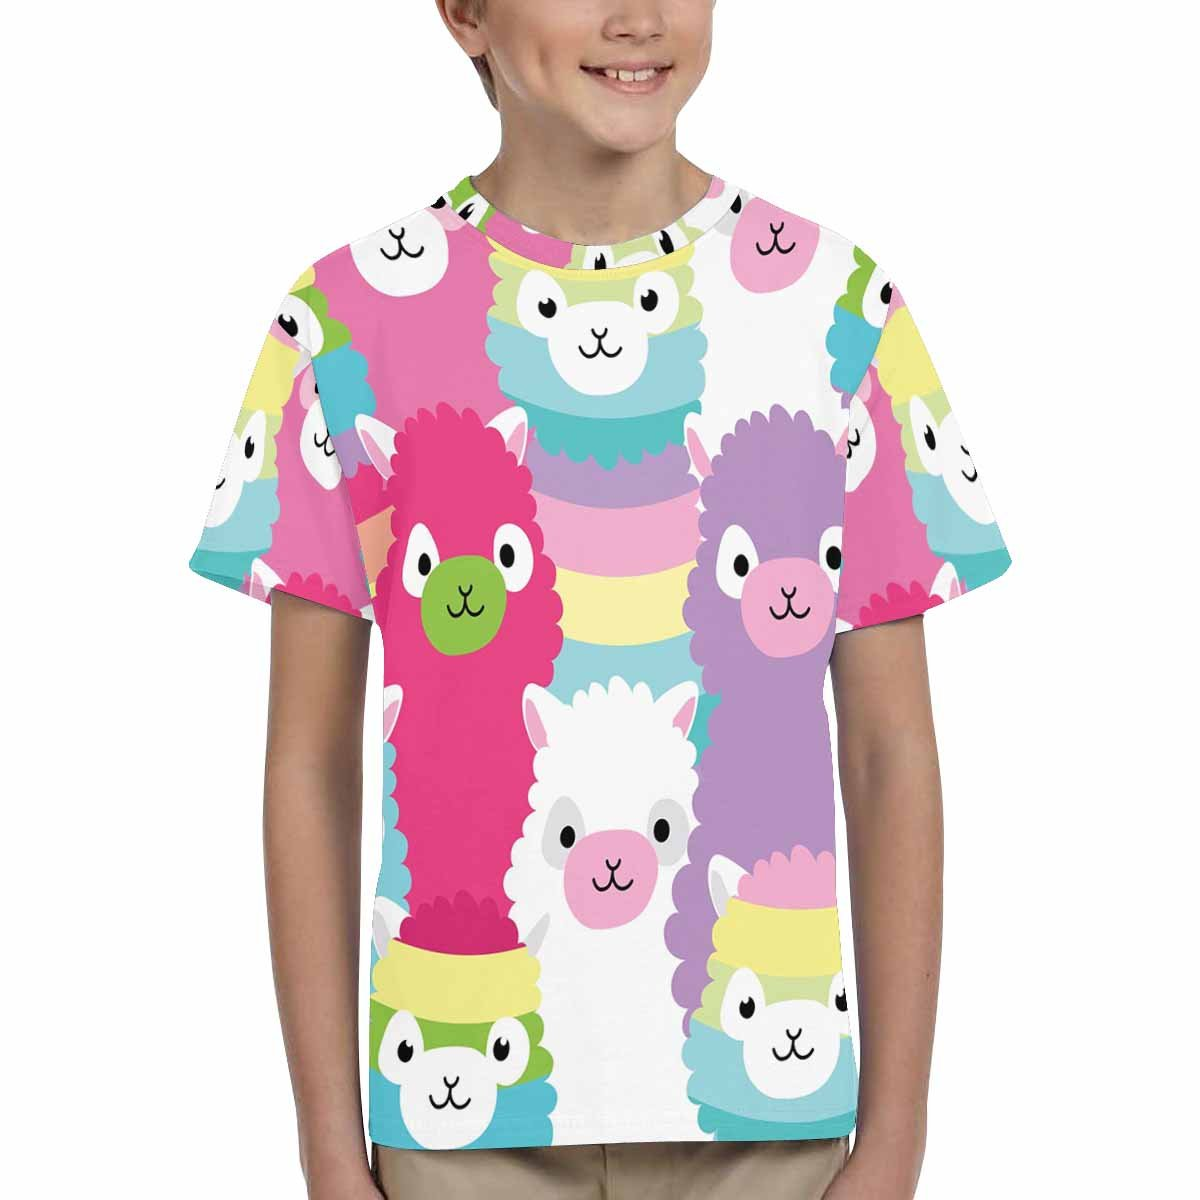 XS-XL INTERESTPRINT Alpaca Family Portrait Unisex Kids T-Shirts